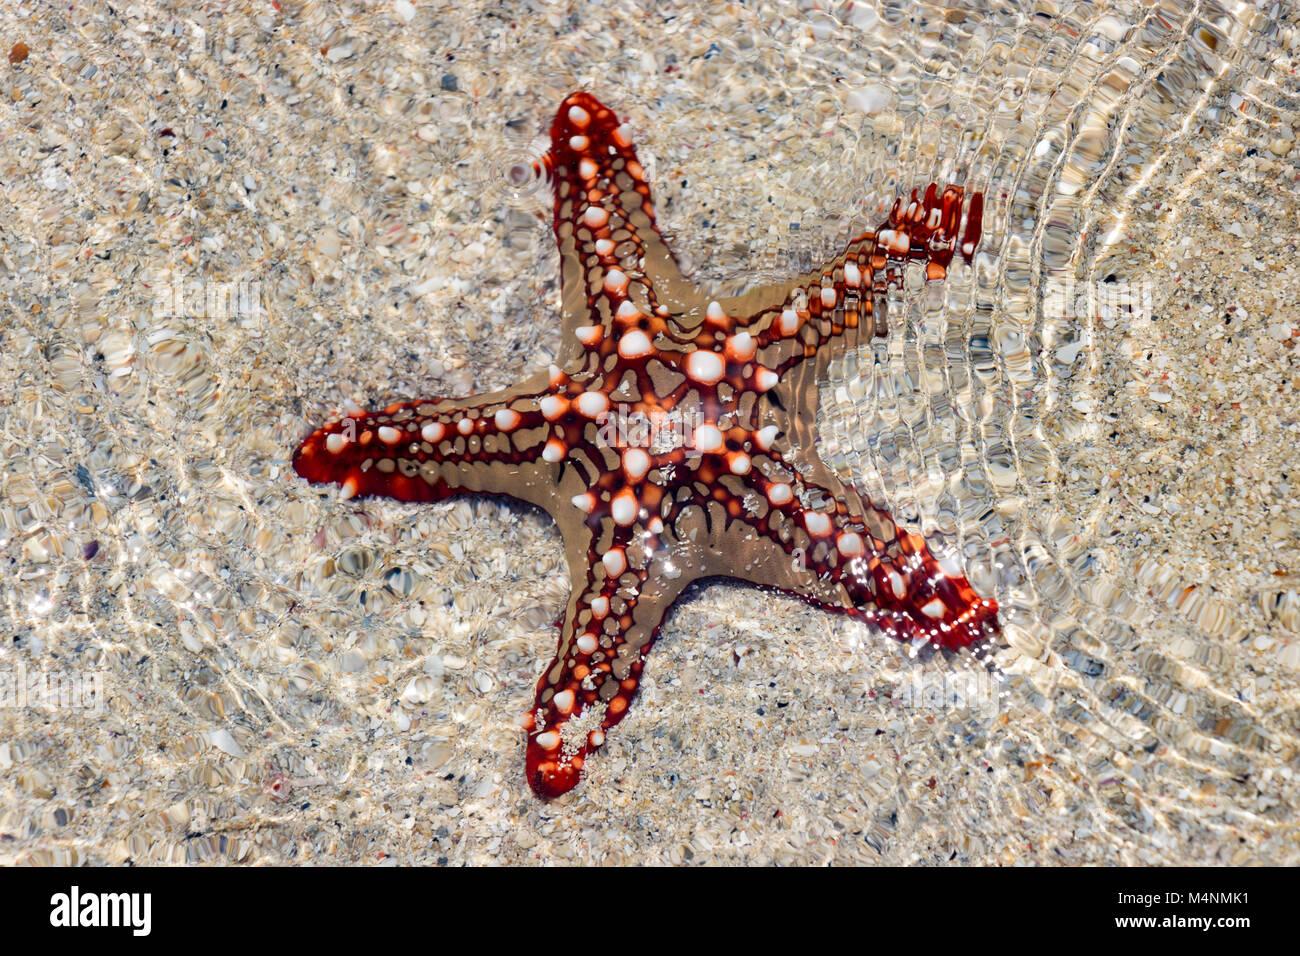 Red Knob Sea Star Stock Photos Amp Red Knob Sea Star Stock